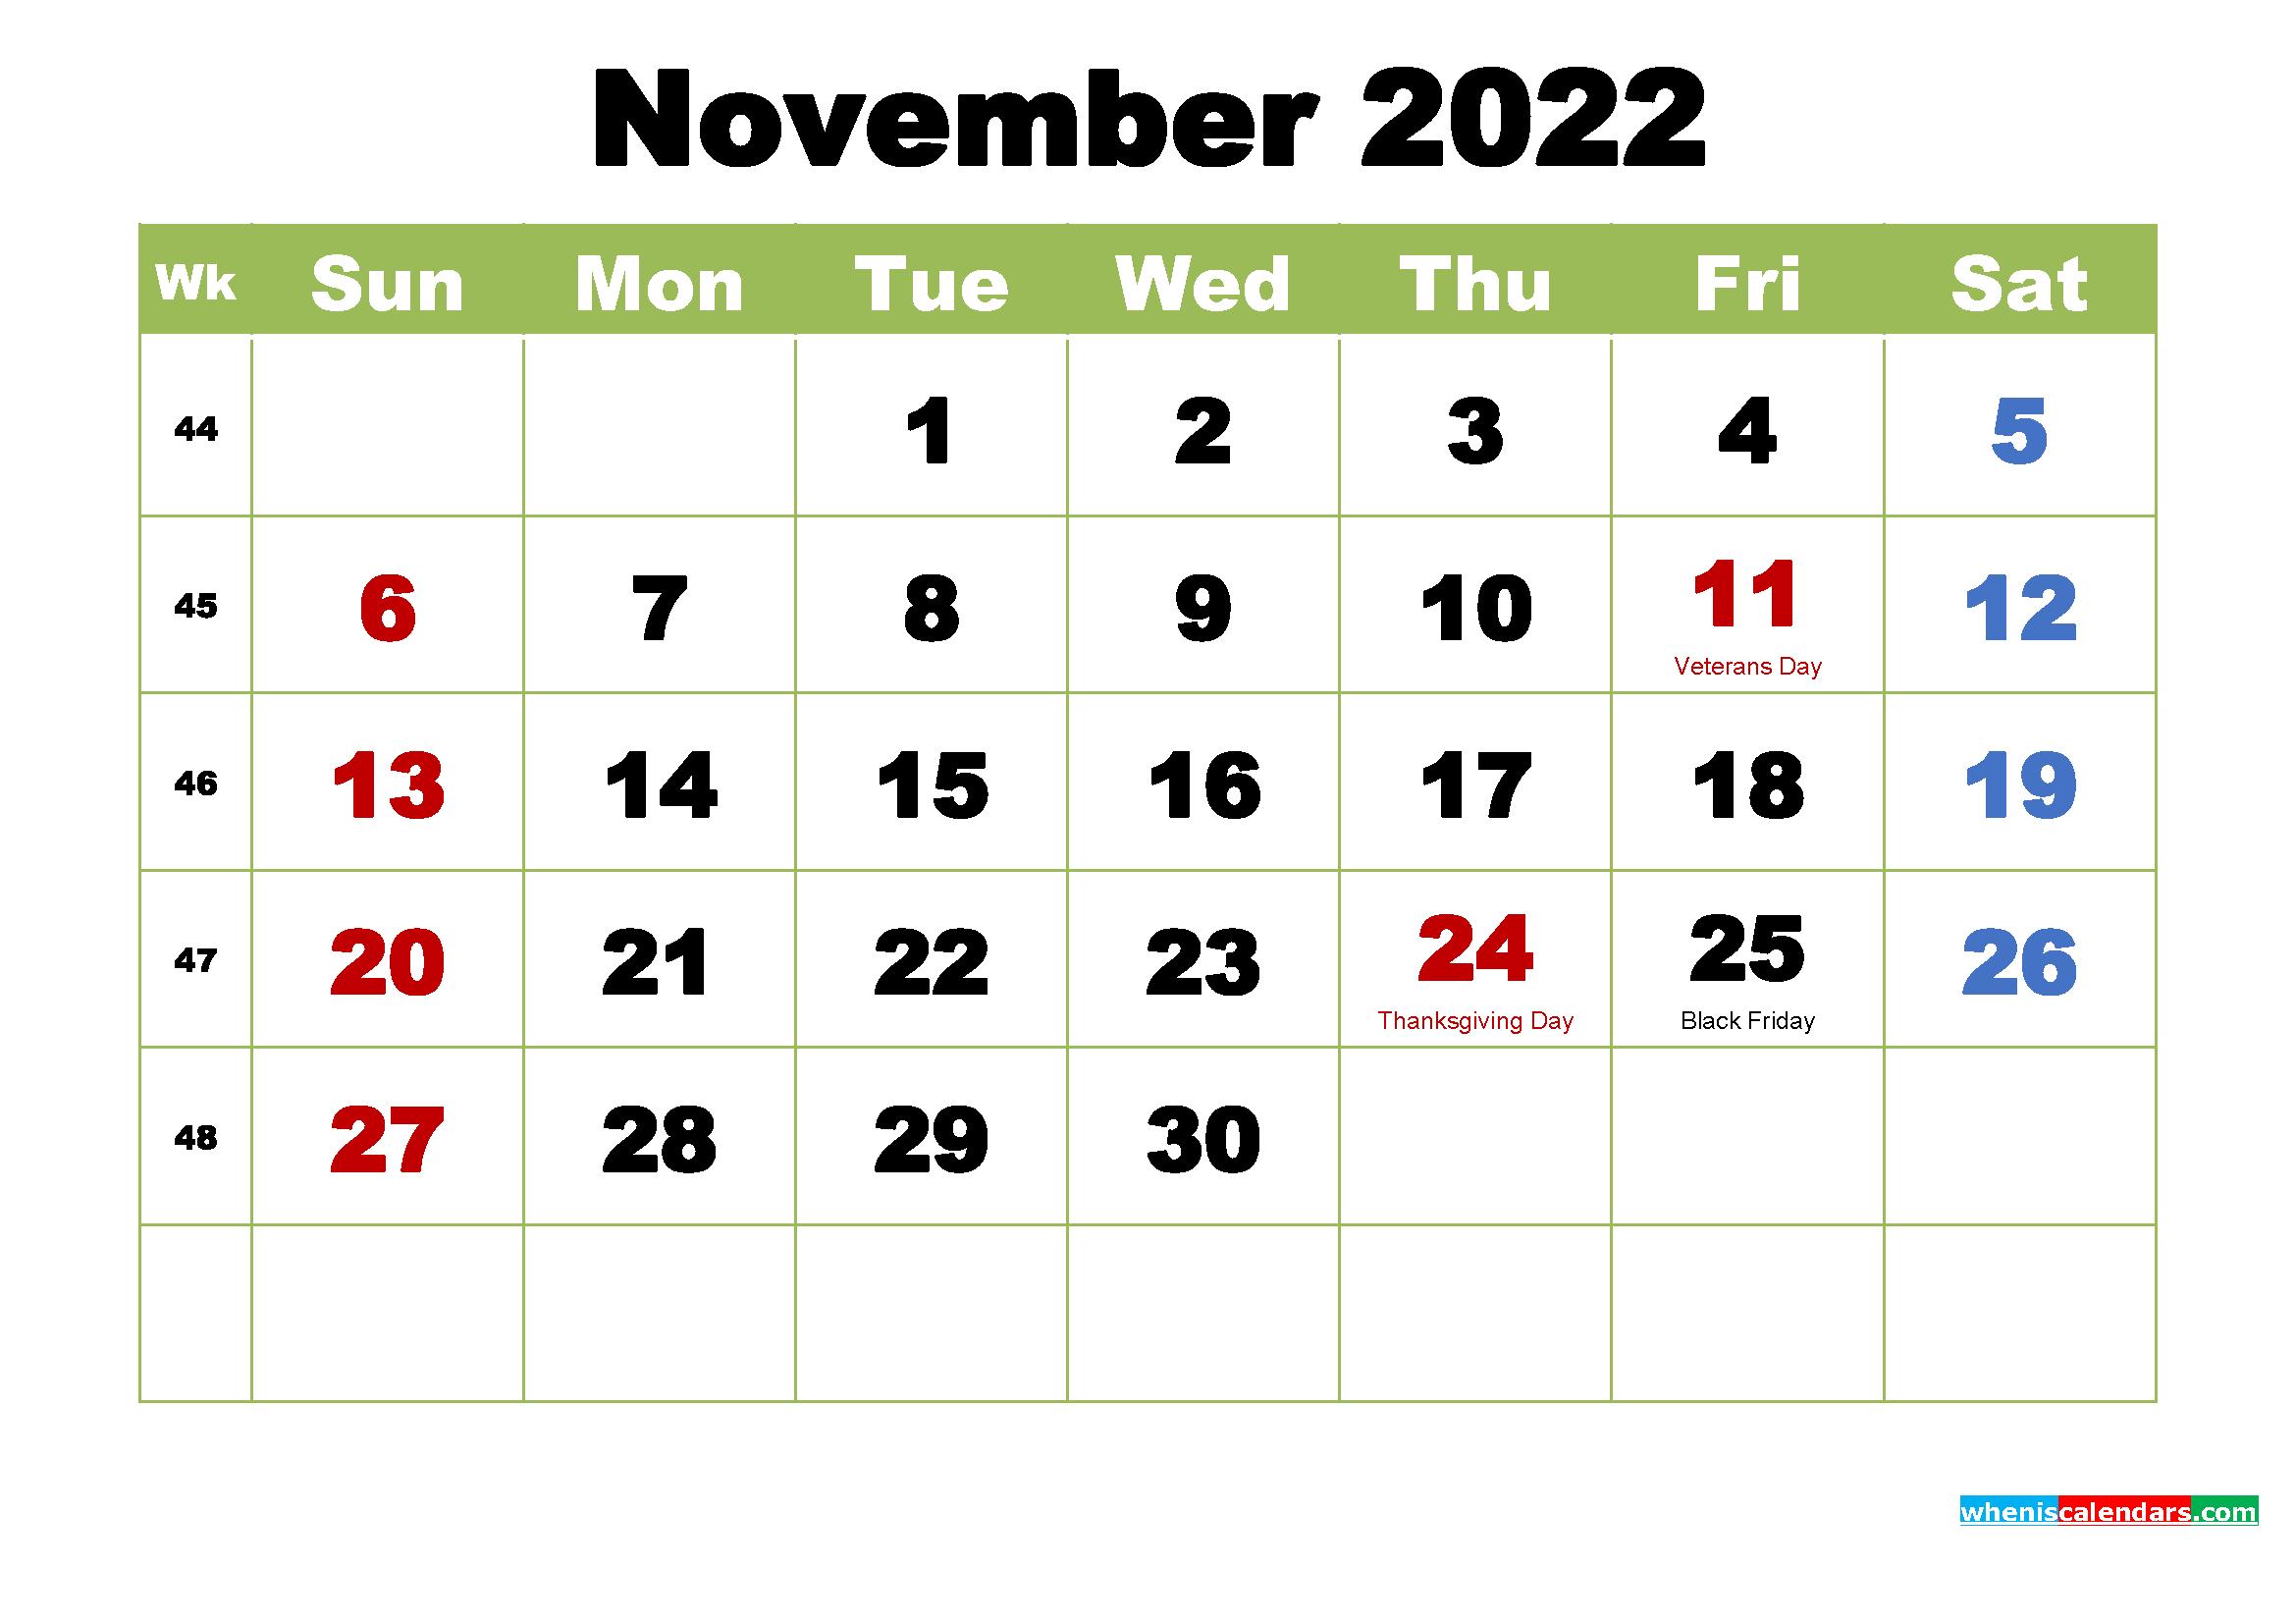 November 2022 Desktop Calendar with Holidays